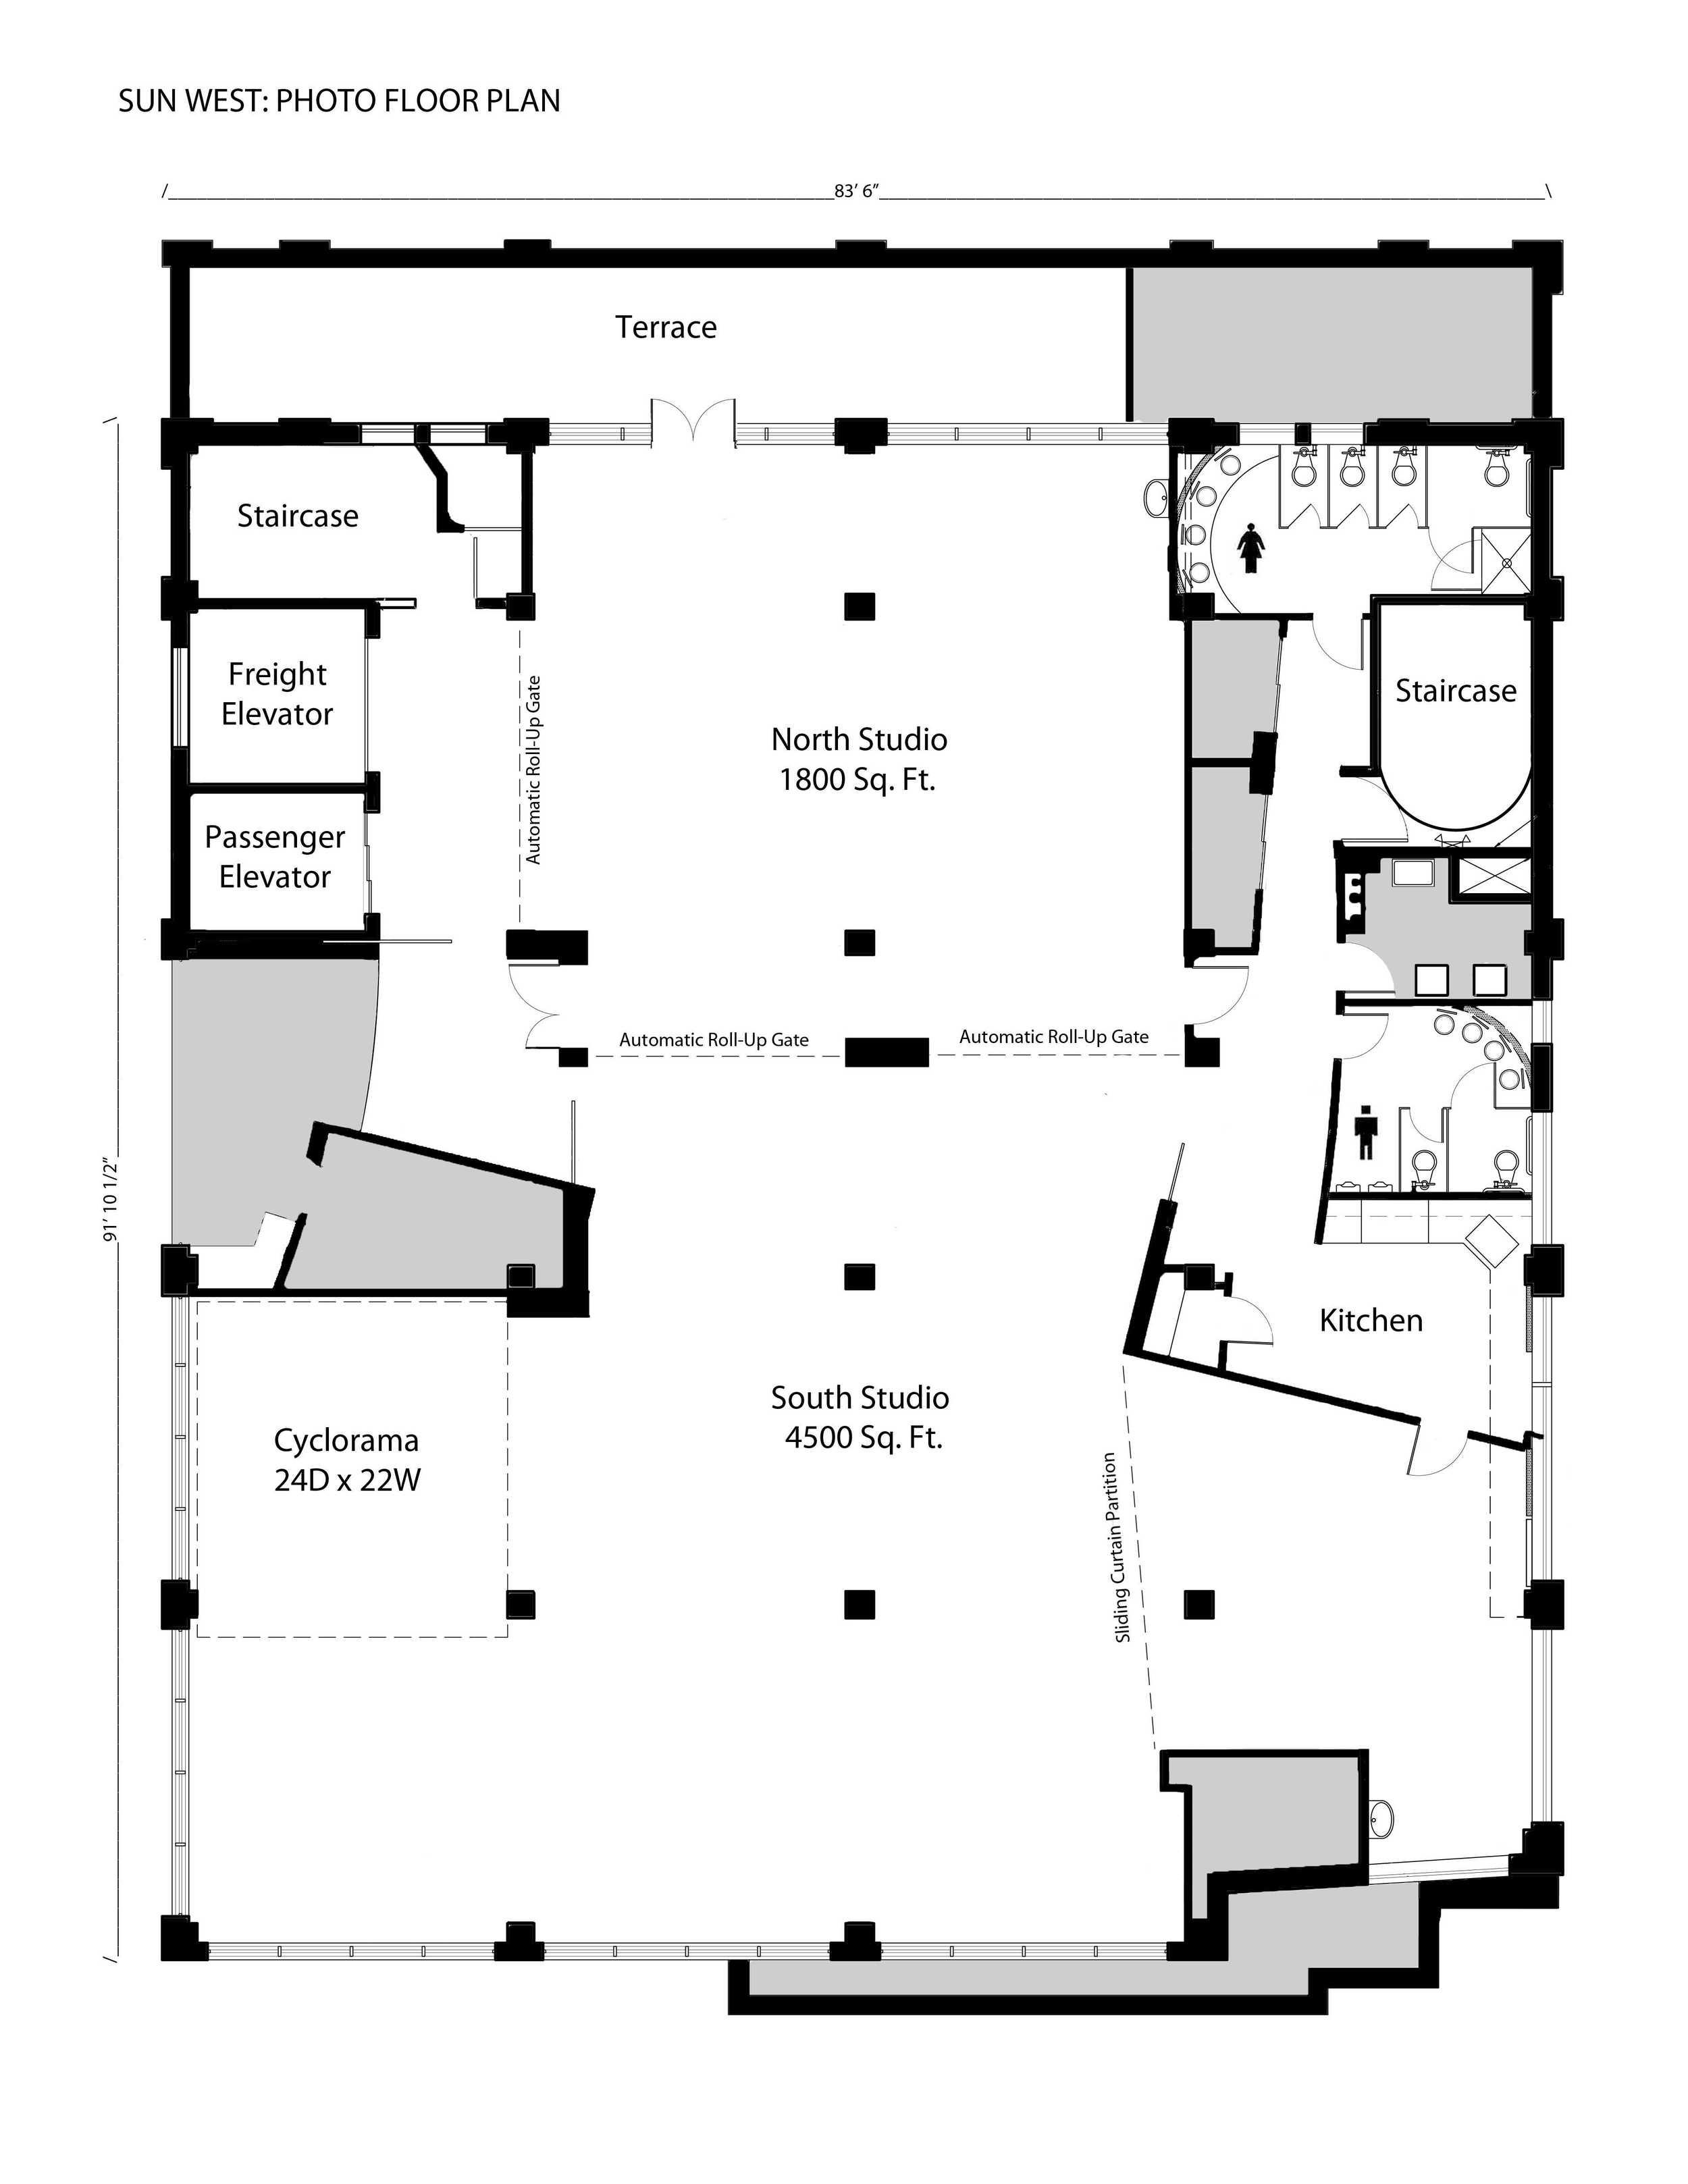 Photo Floor Plan Hi Res.jpg